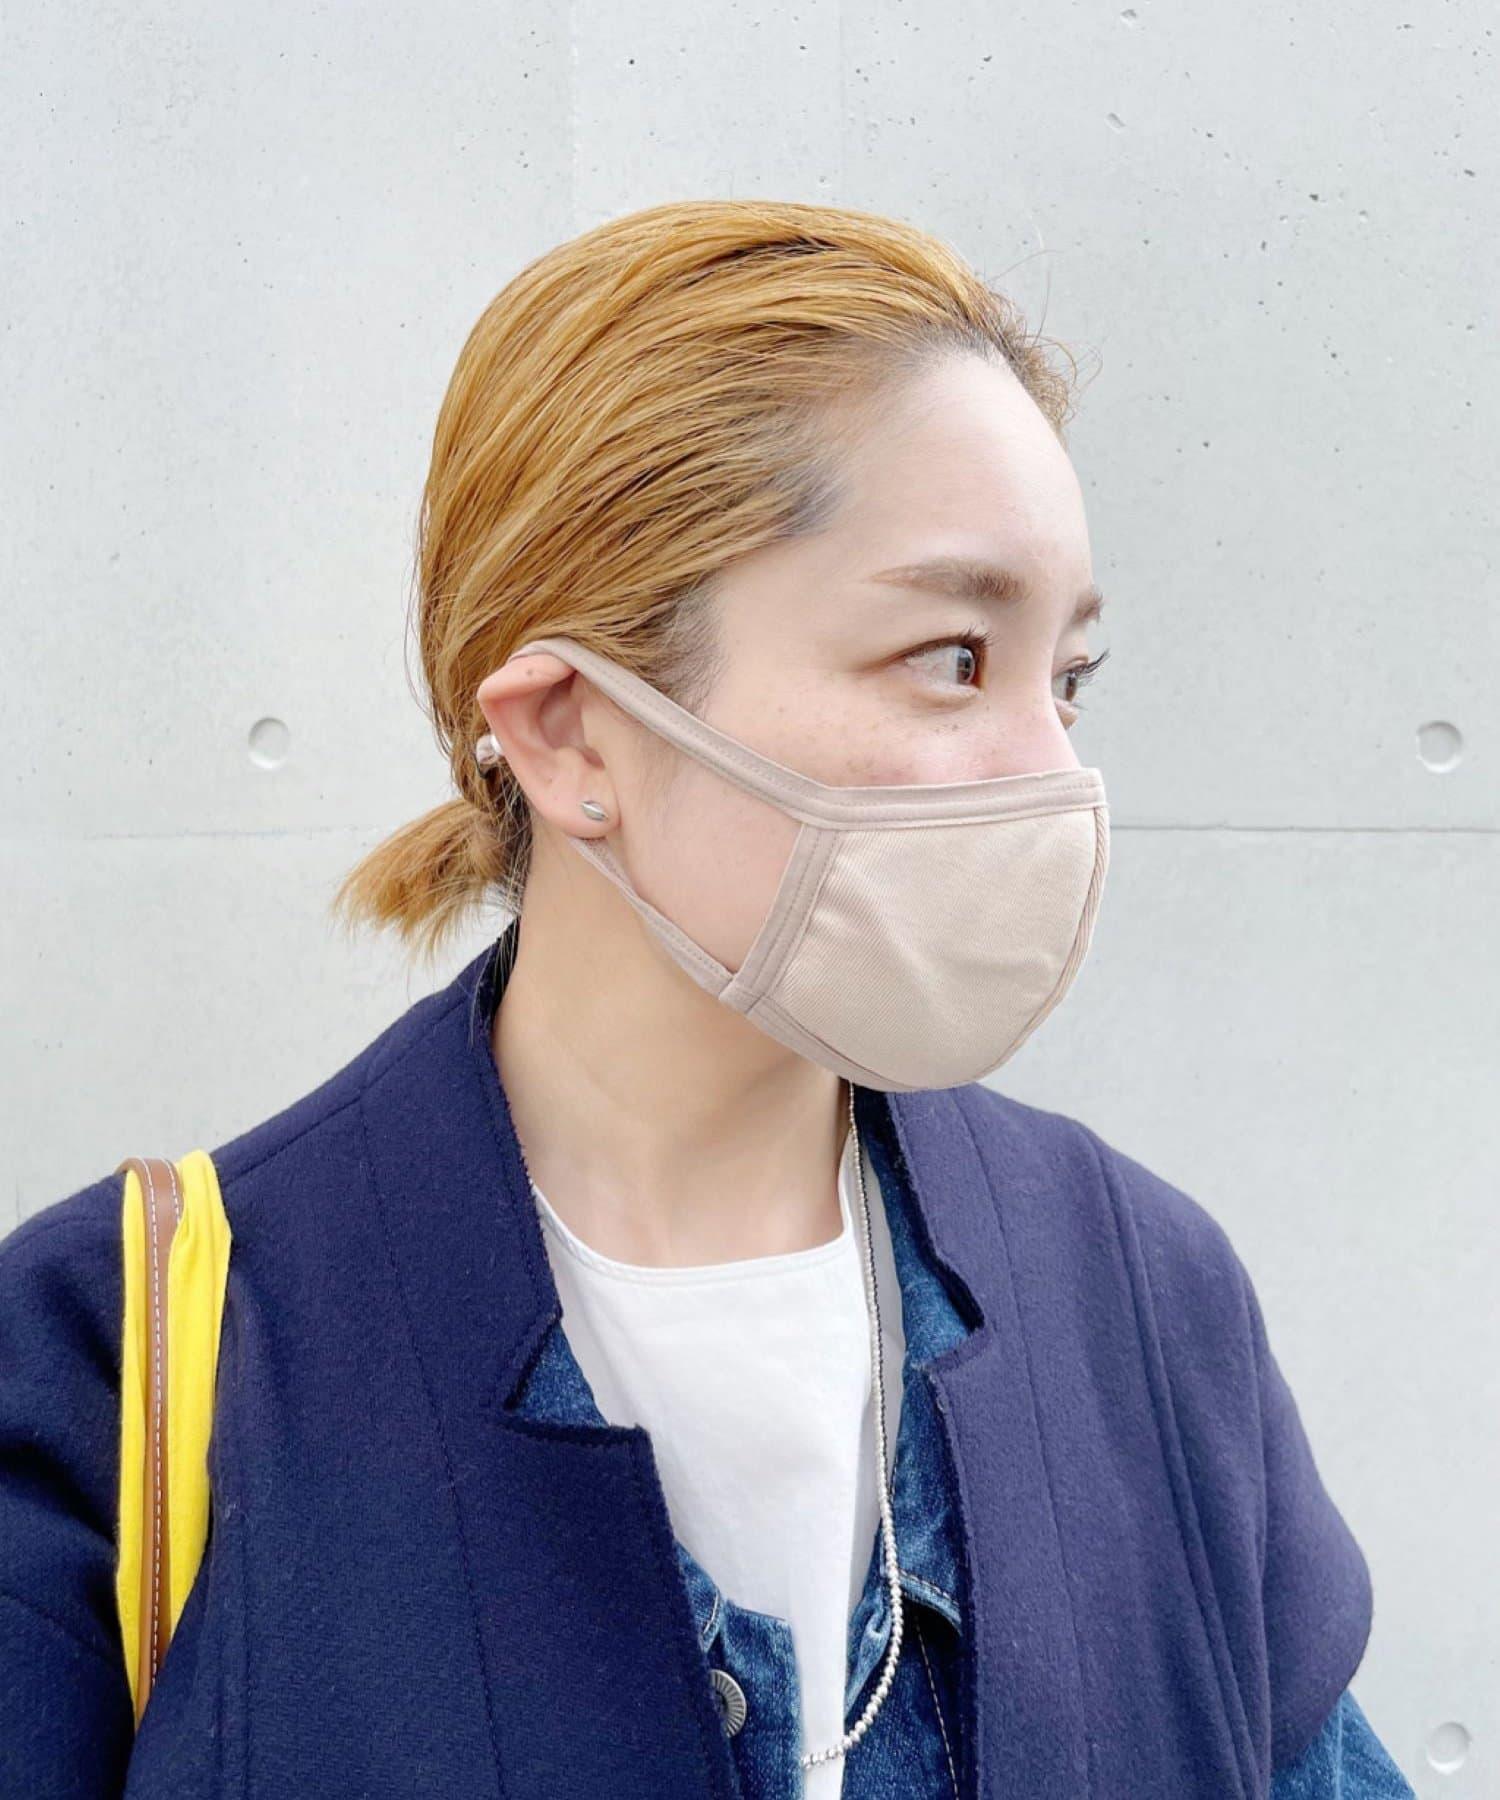 SHENERY(シーナリー) ヤマシンナノフィルター UVマスク